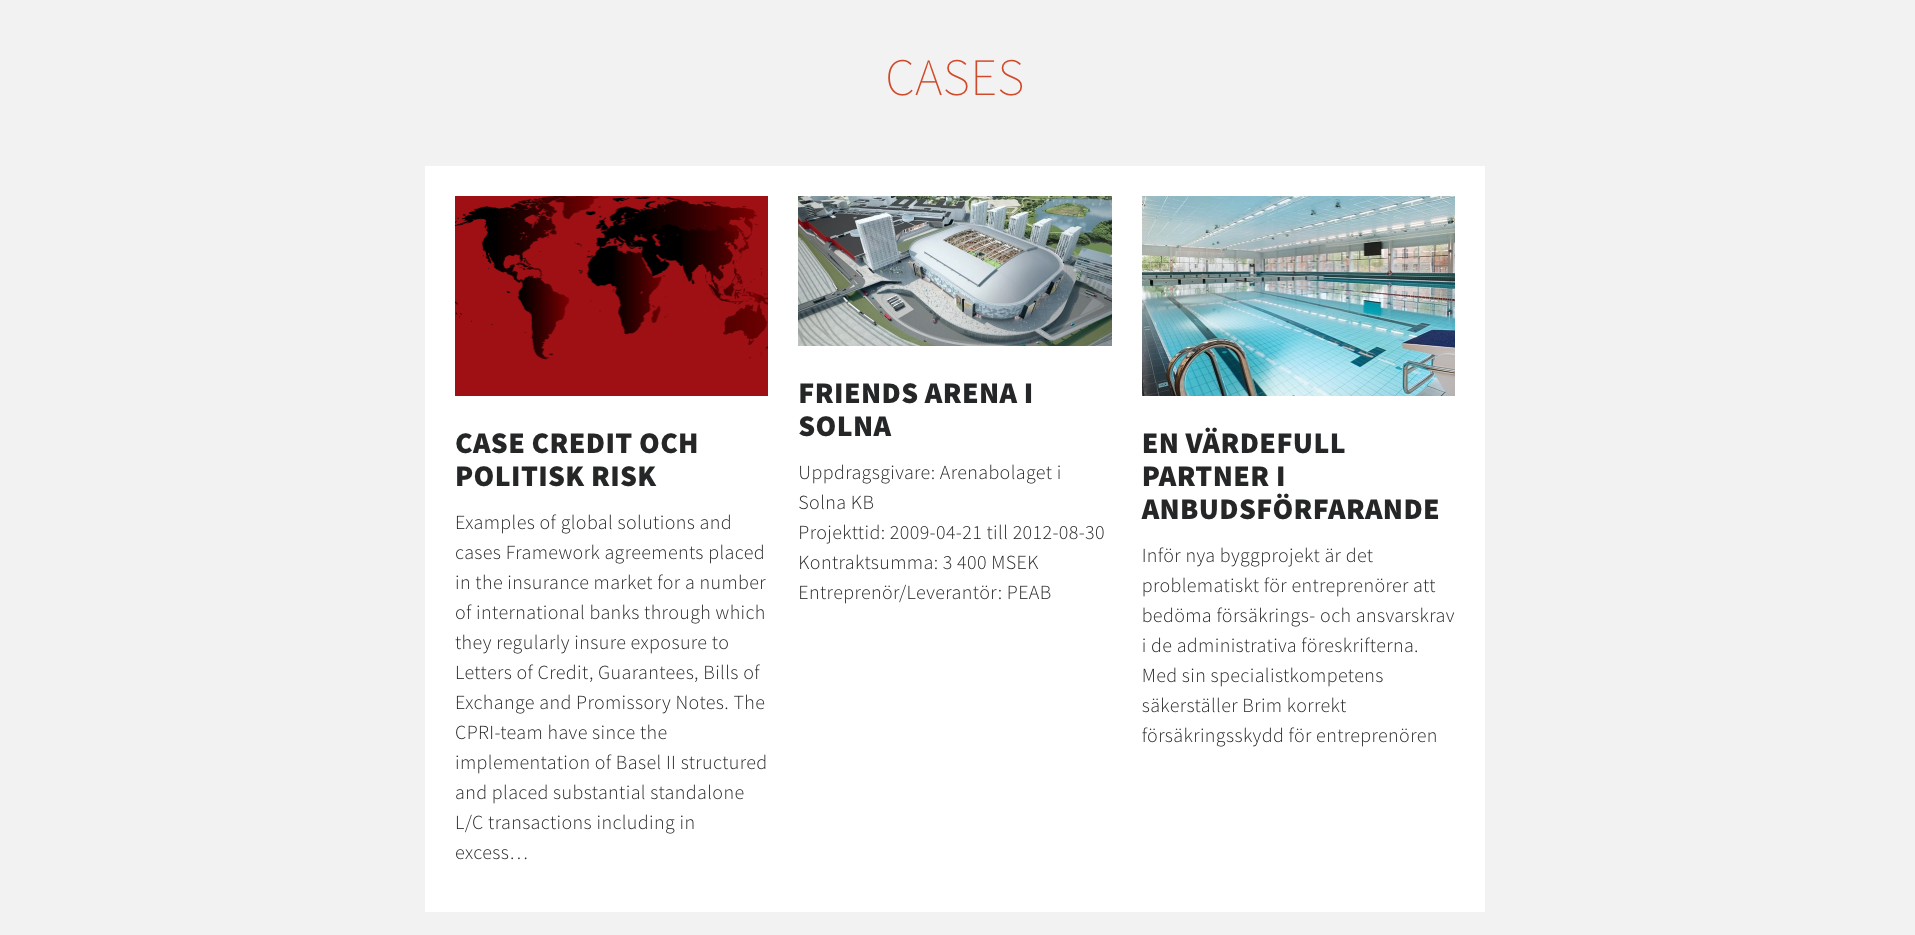 Case study images